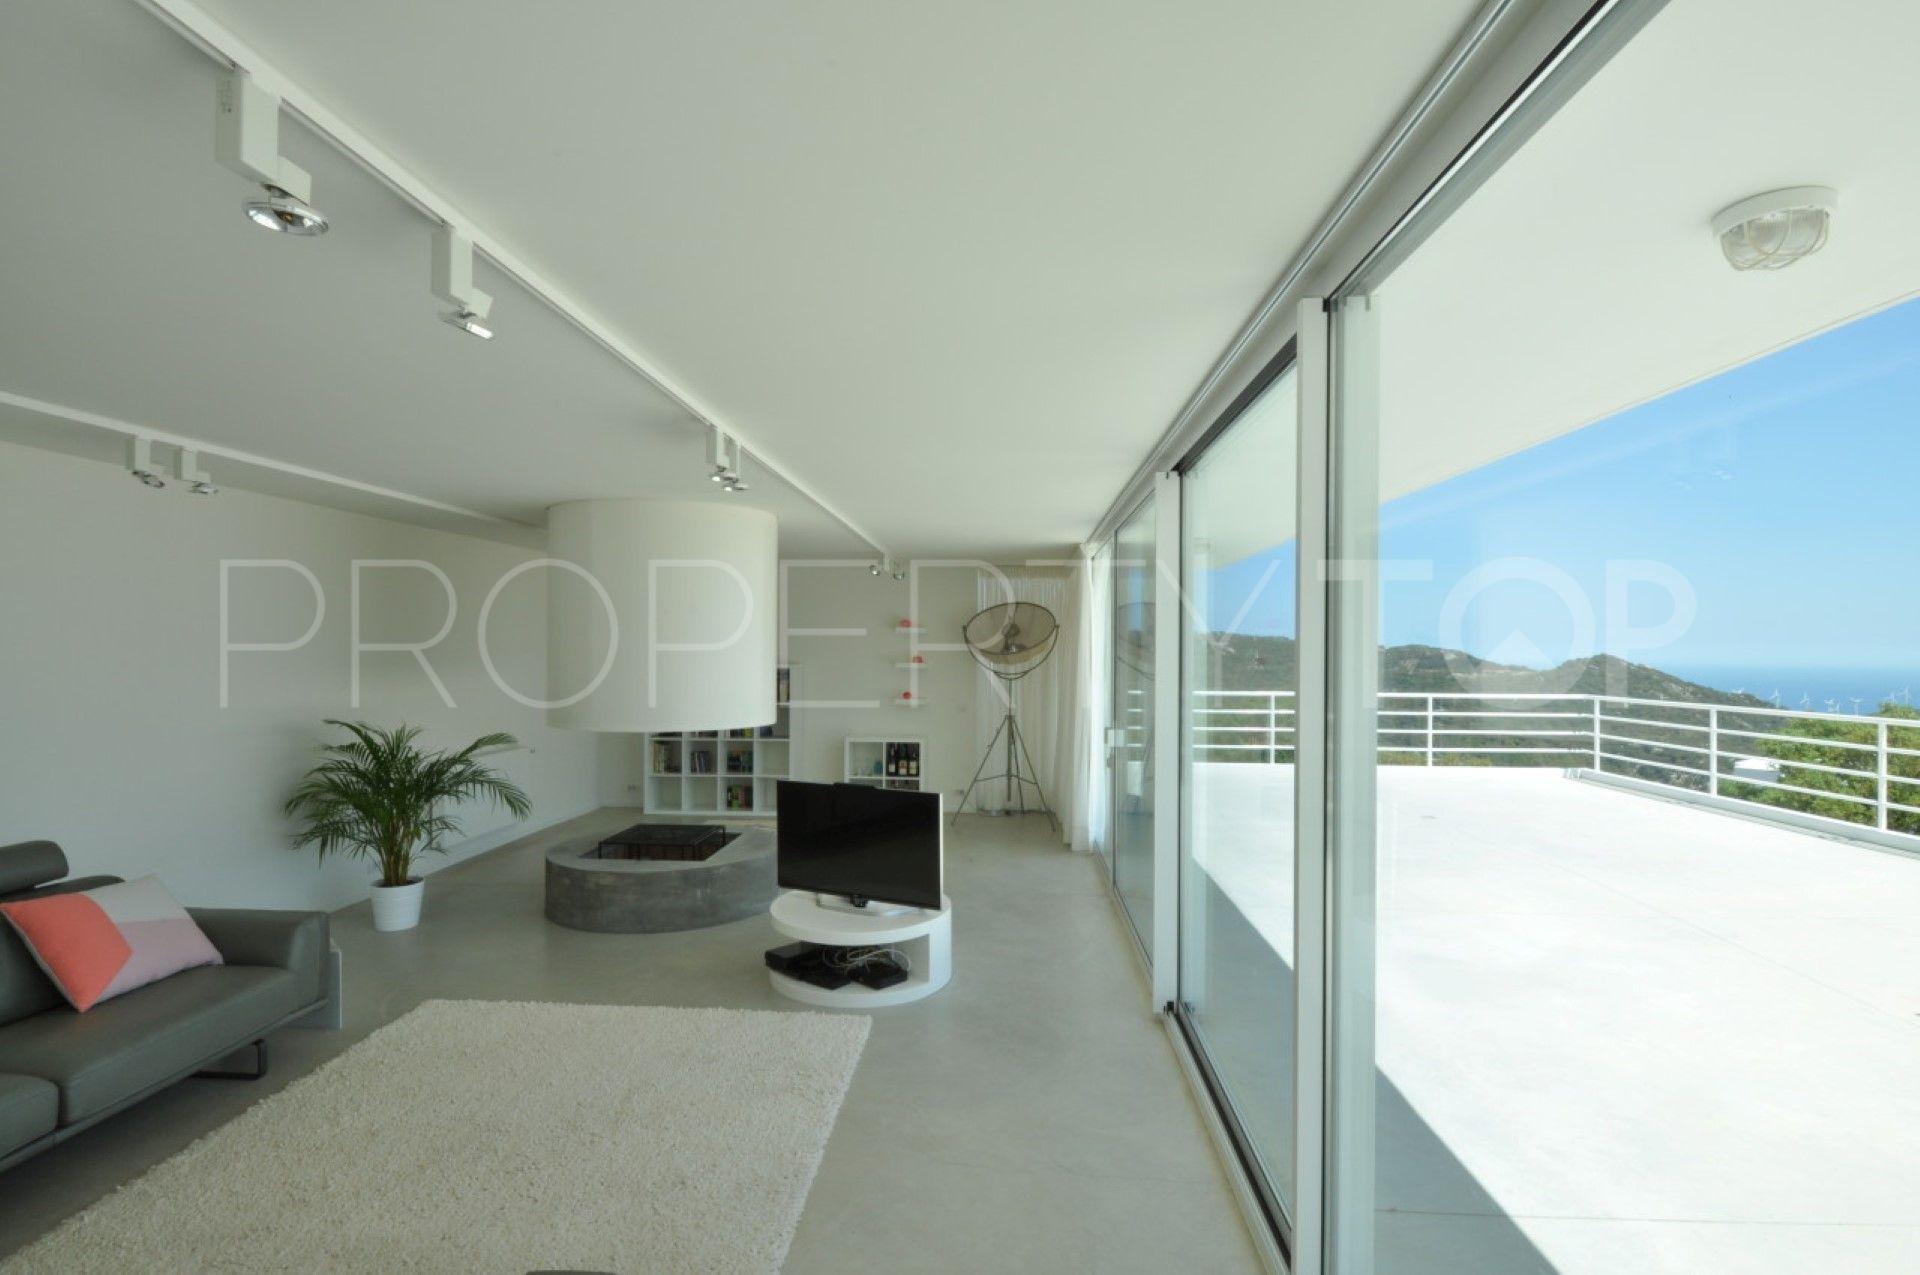 buy villa in tarifa with 4 bedrooms terra meridiana. Black Bedroom Furniture Sets. Home Design Ideas